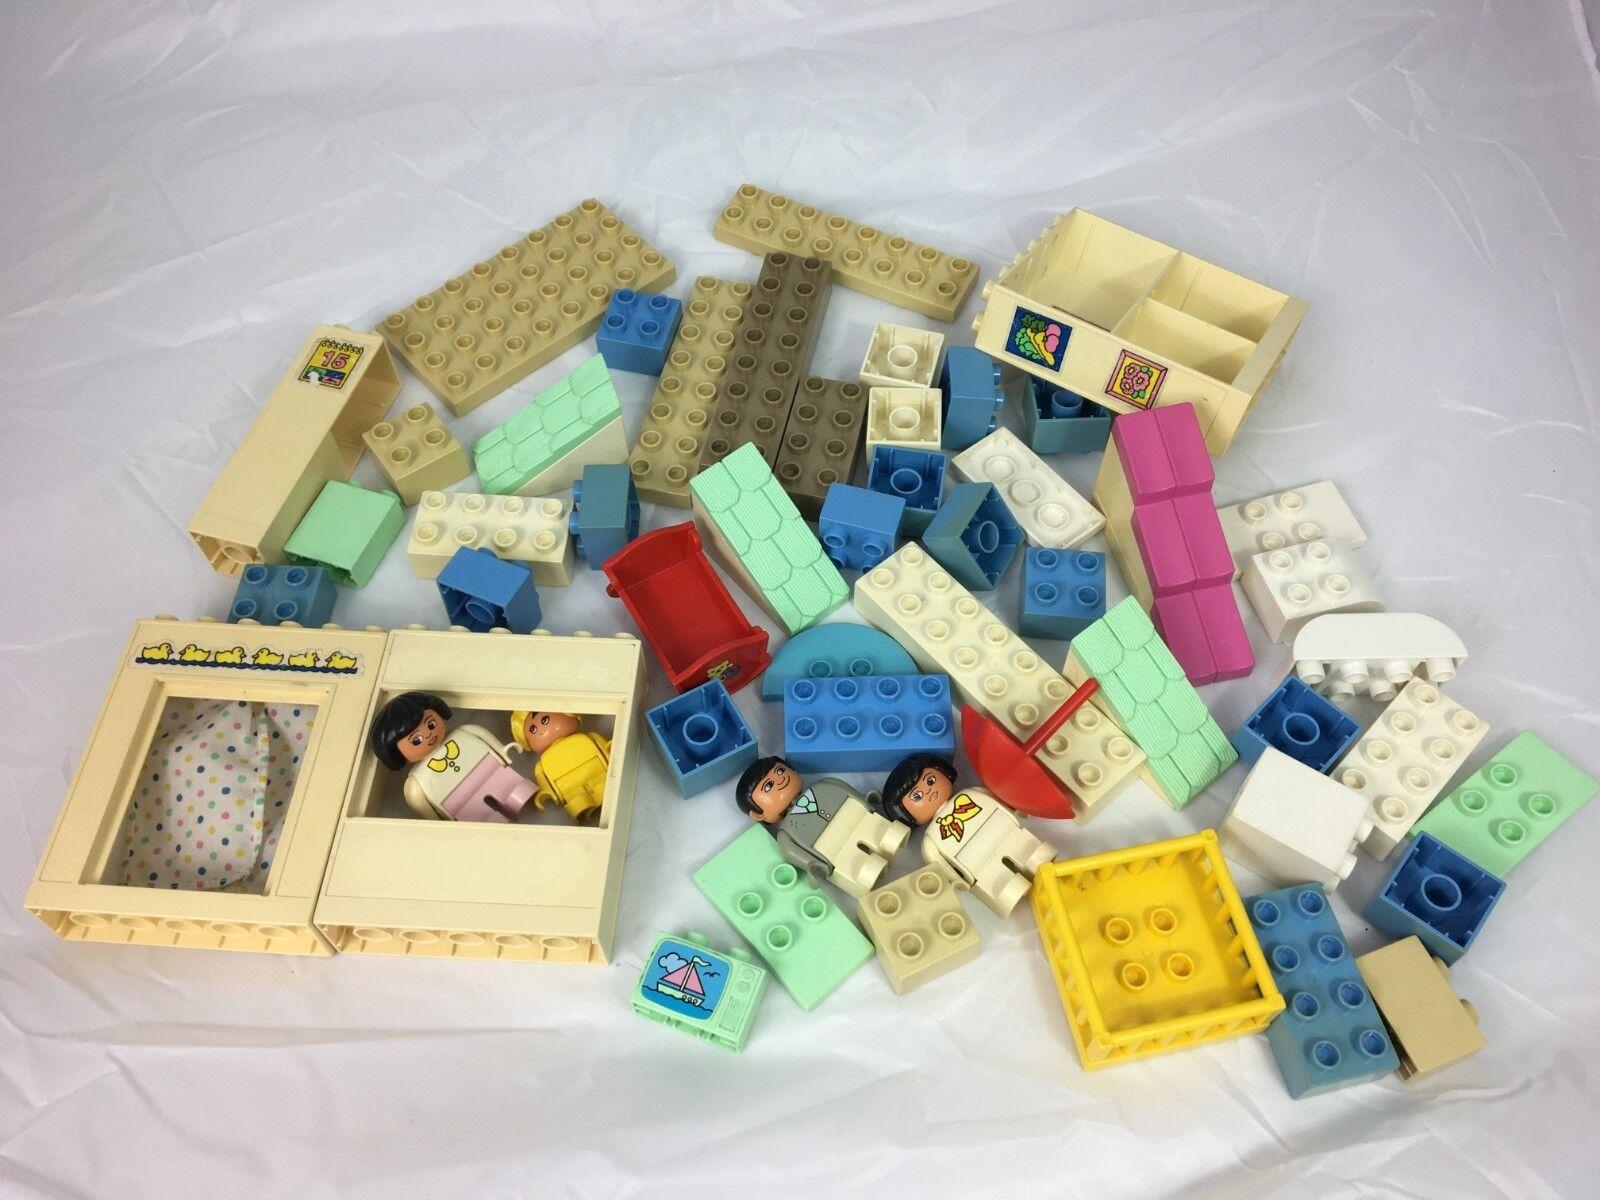 Duplo Lego 2794 My Family House Spares plus baby extras Vintage